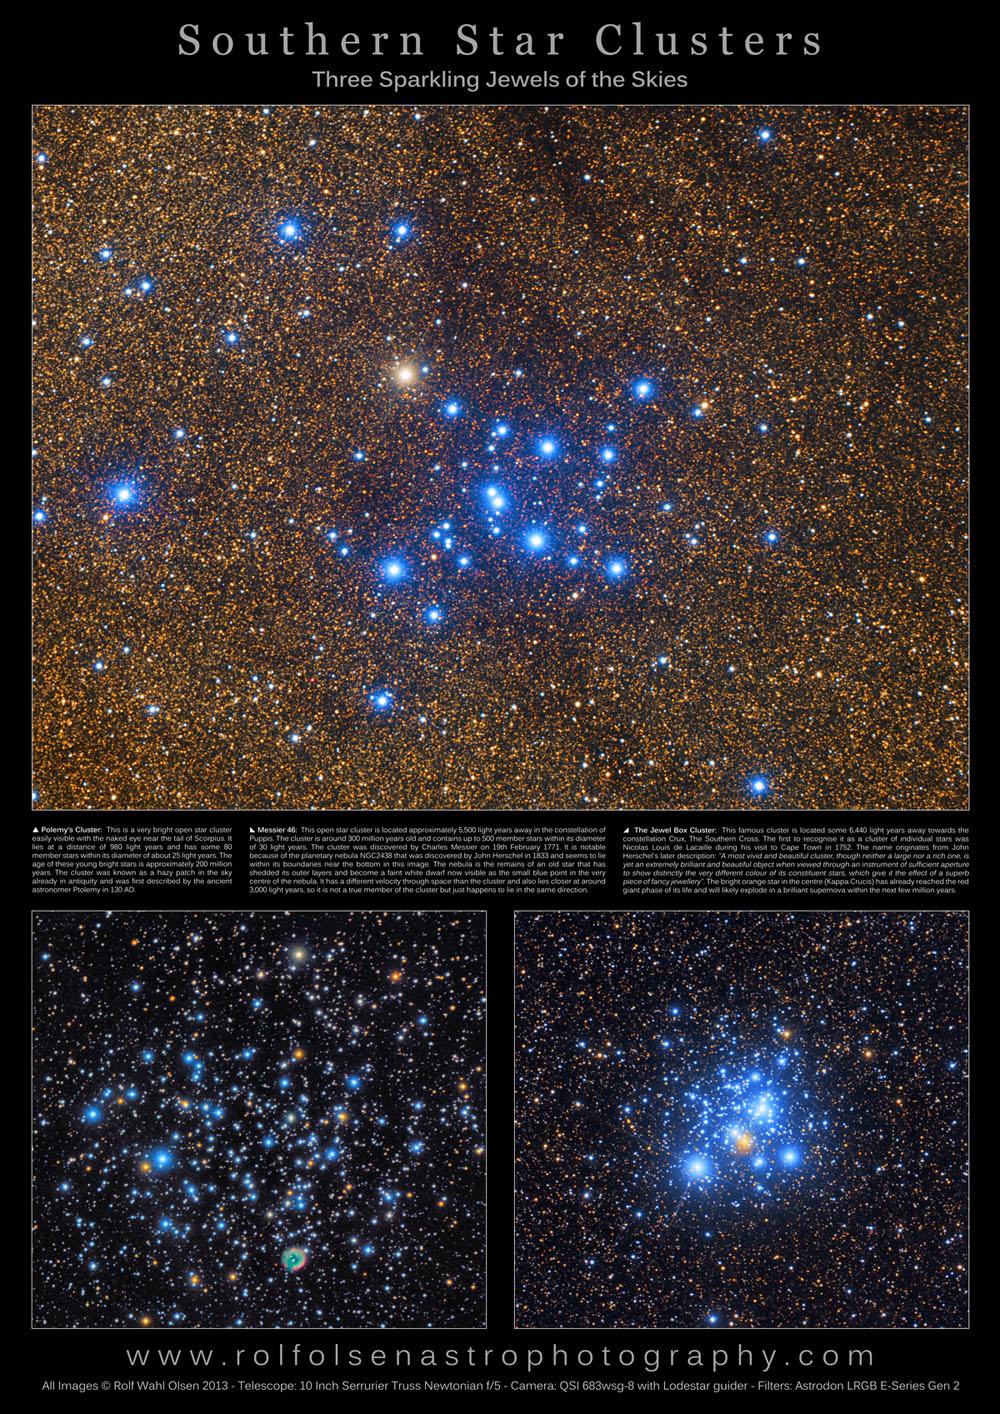 Contoh gugus bintang terbuka lainnya. Atas : Gugus bintang Ptolemy, kanan bawah : Jewel Box, kiri bawah : Messier 46. Sumber : rolfolsenastrophotography.com